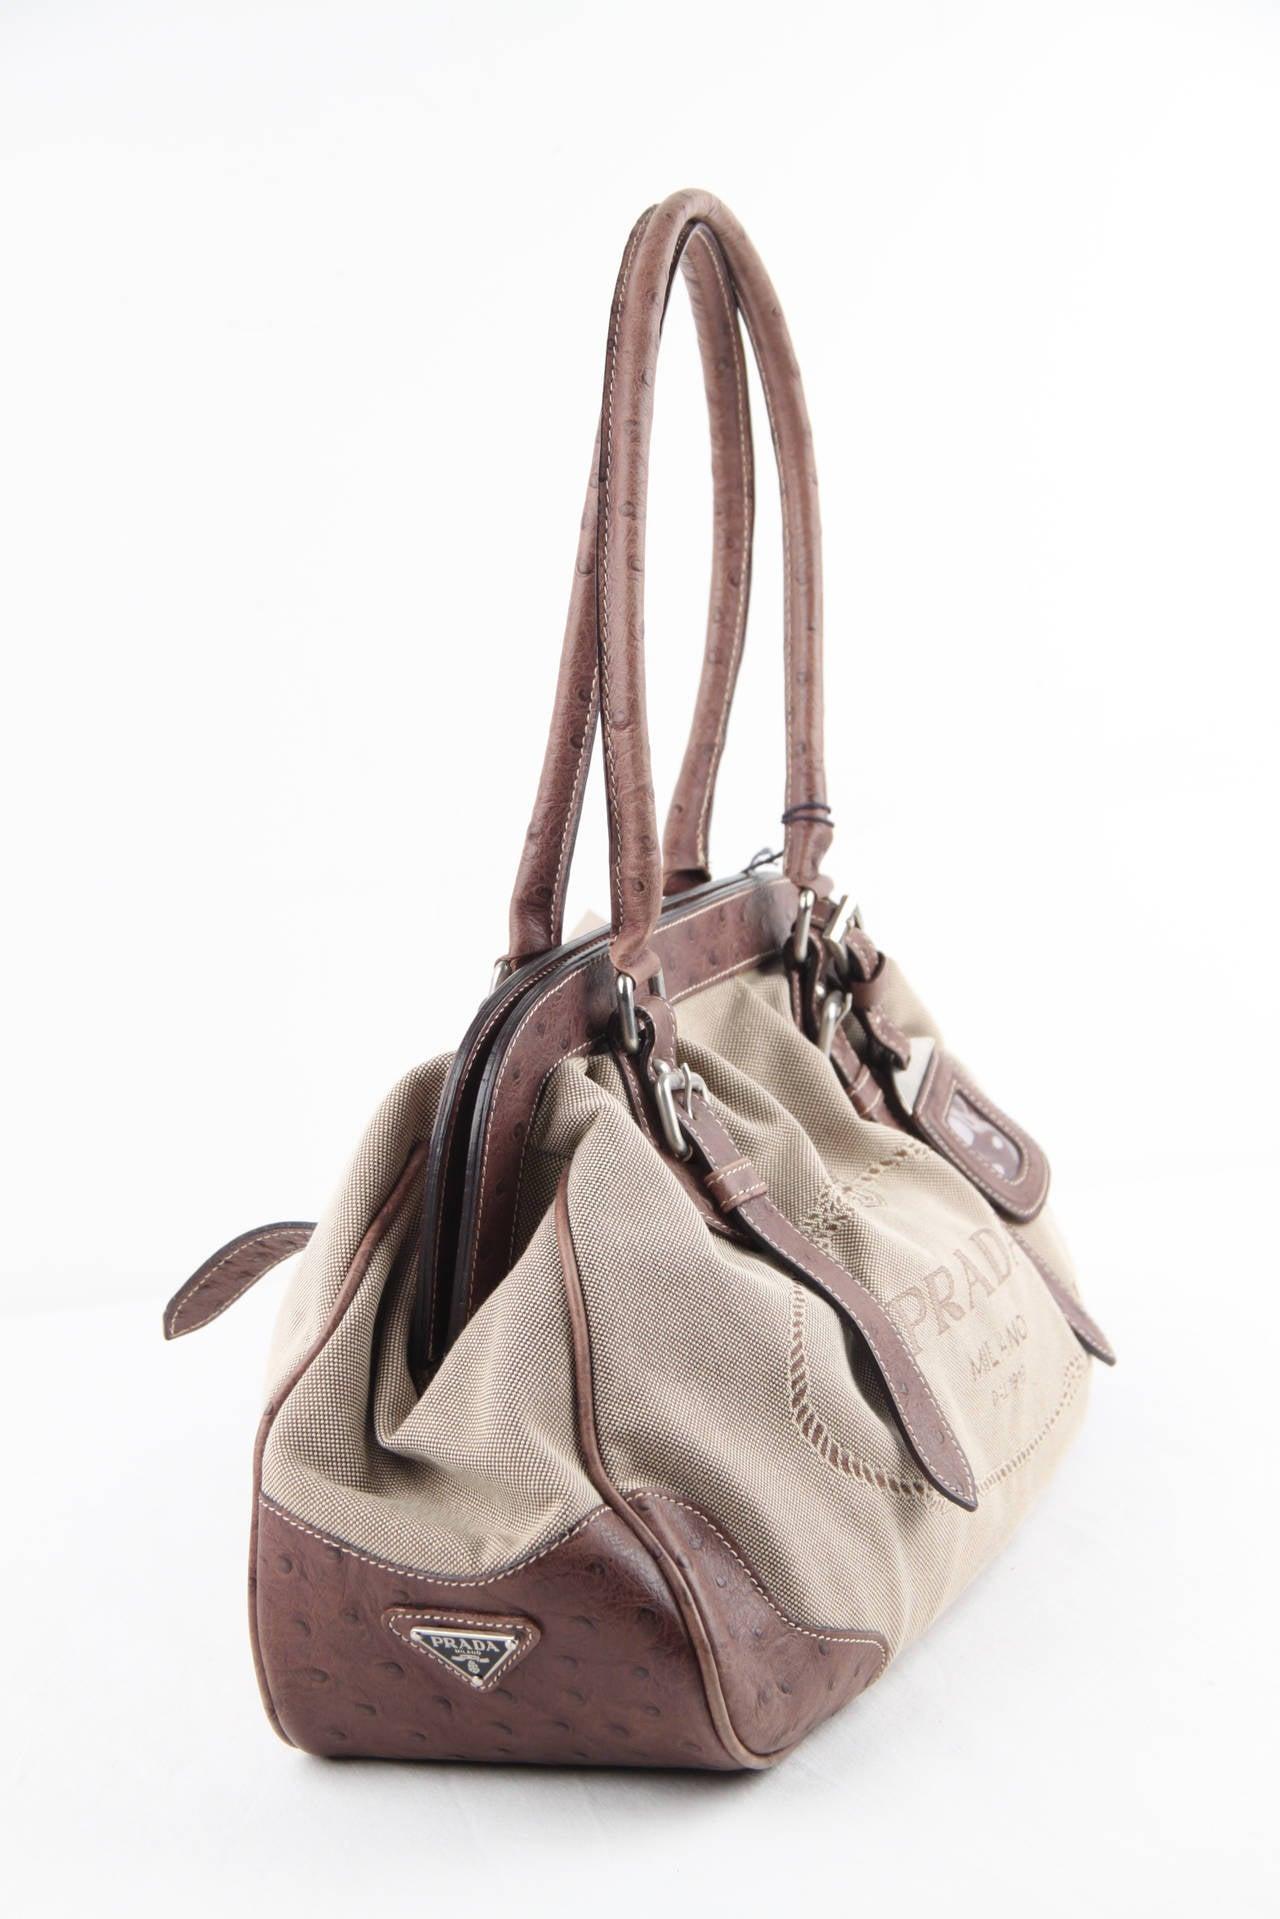 Prada Beige Jacquard Logo Fabric Handbag Doctor Bag W Ostrich Leather 2